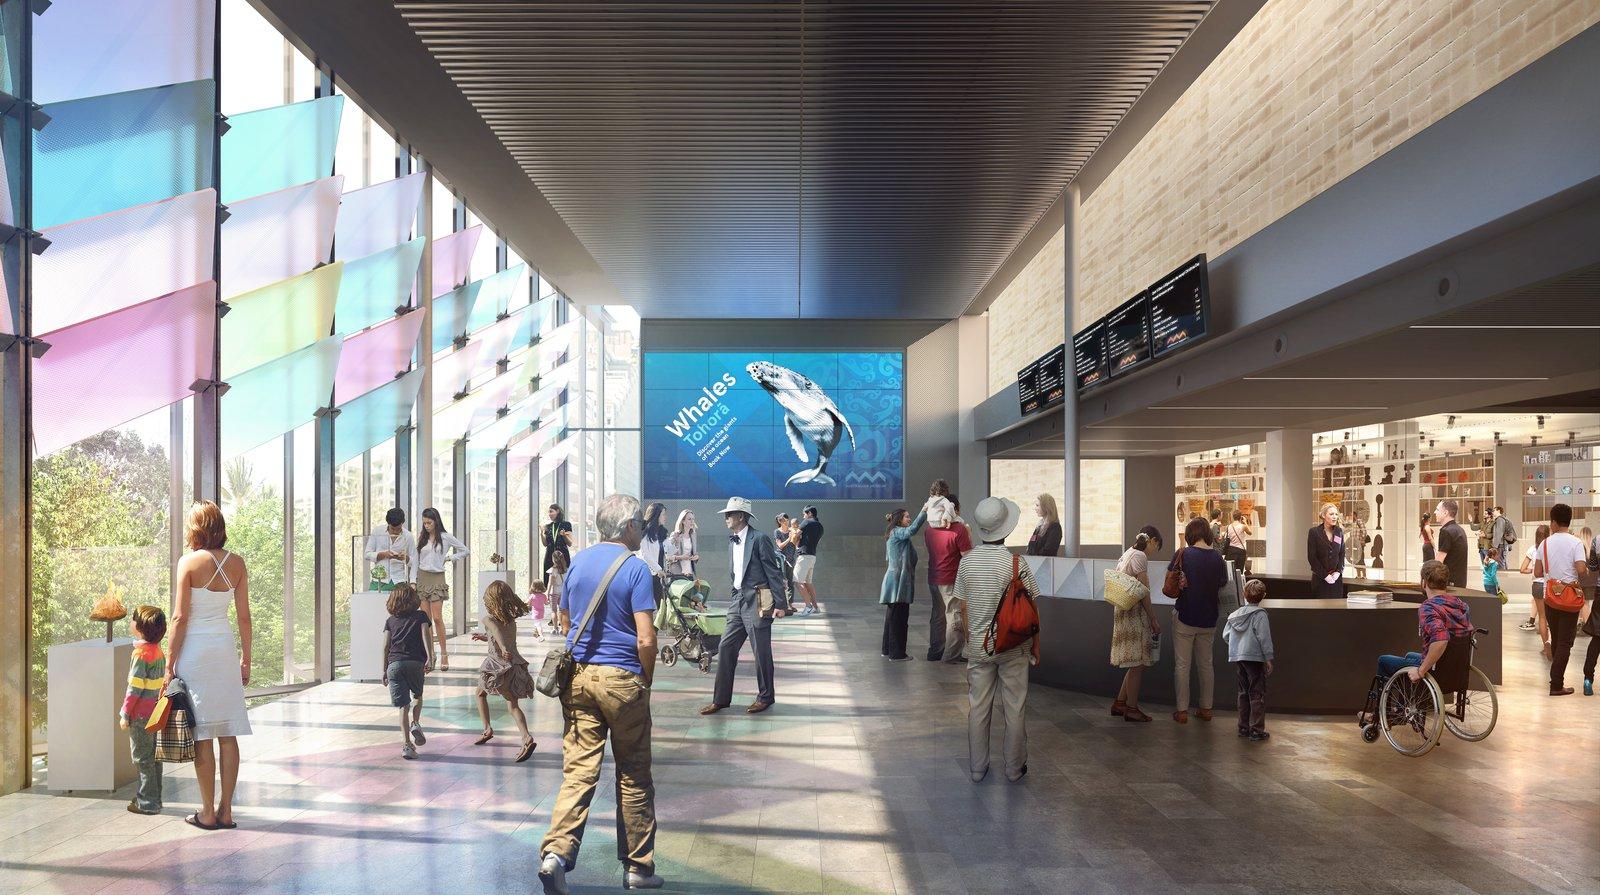 We're building a better museum - The Australian Museum